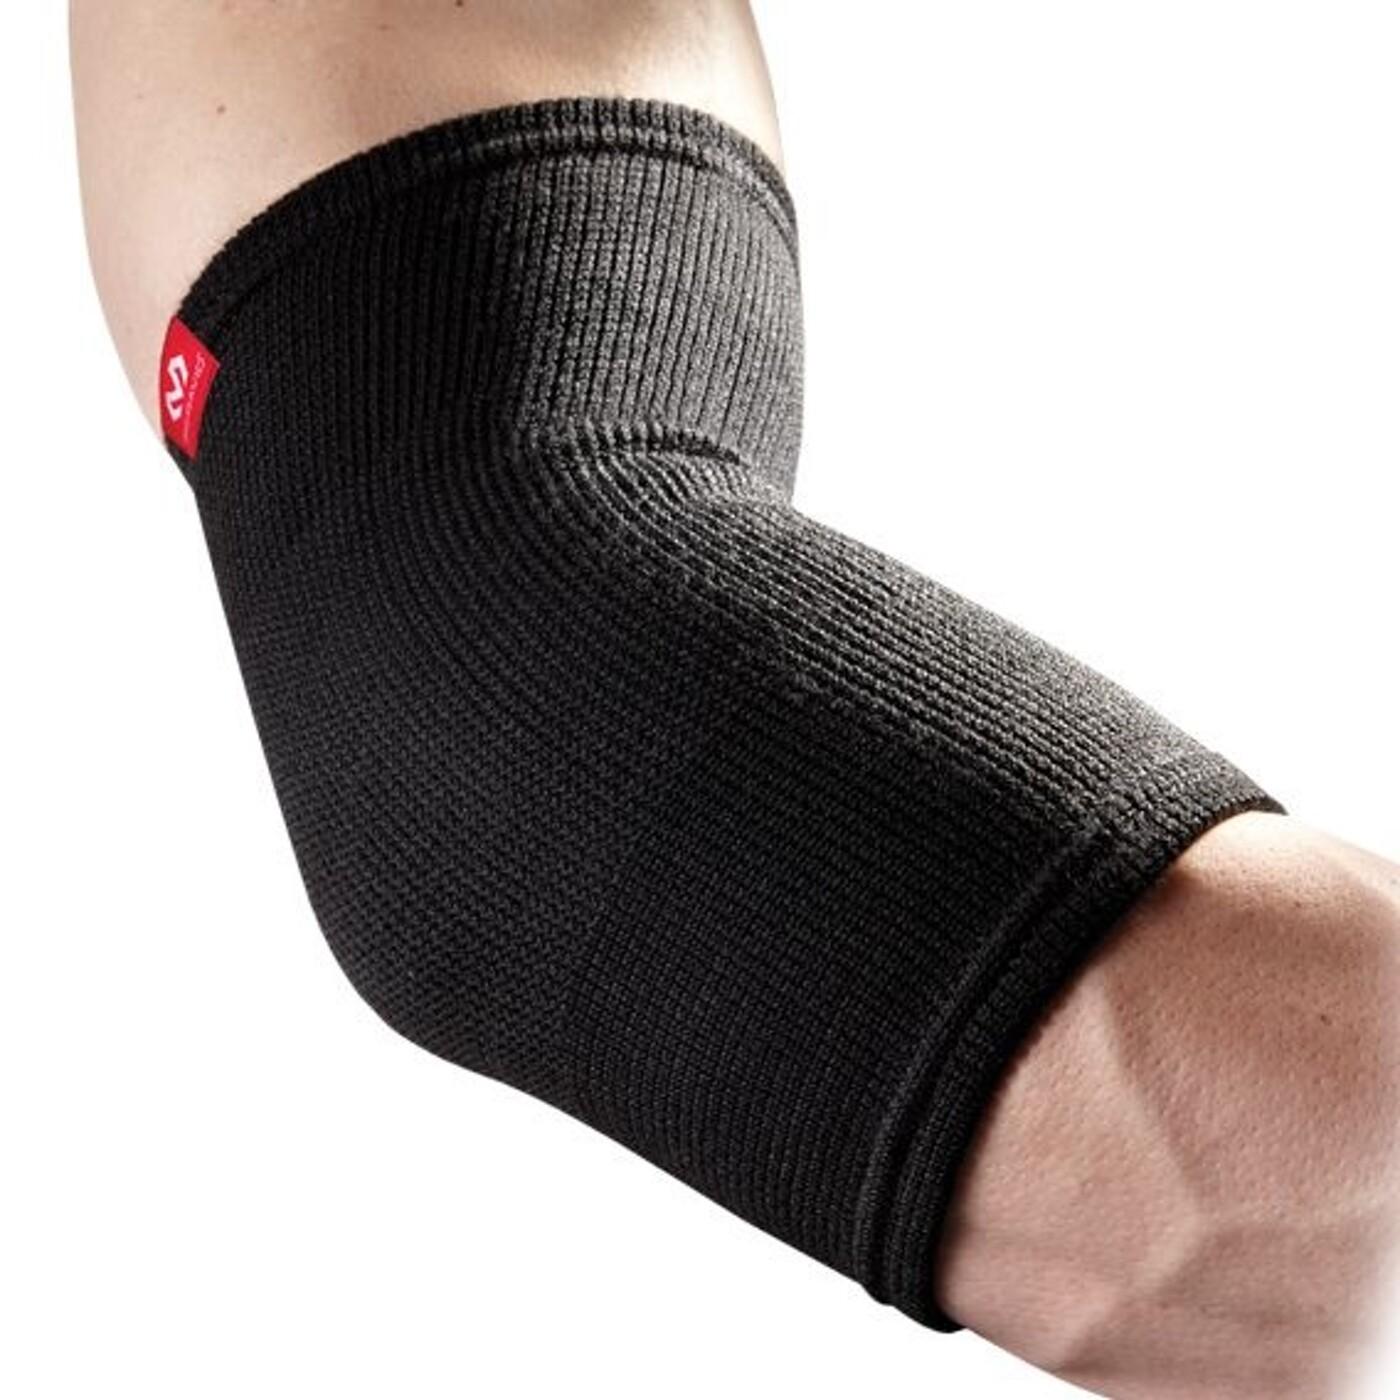 MC DAVID Bandage Ellenbogengelenk 512R